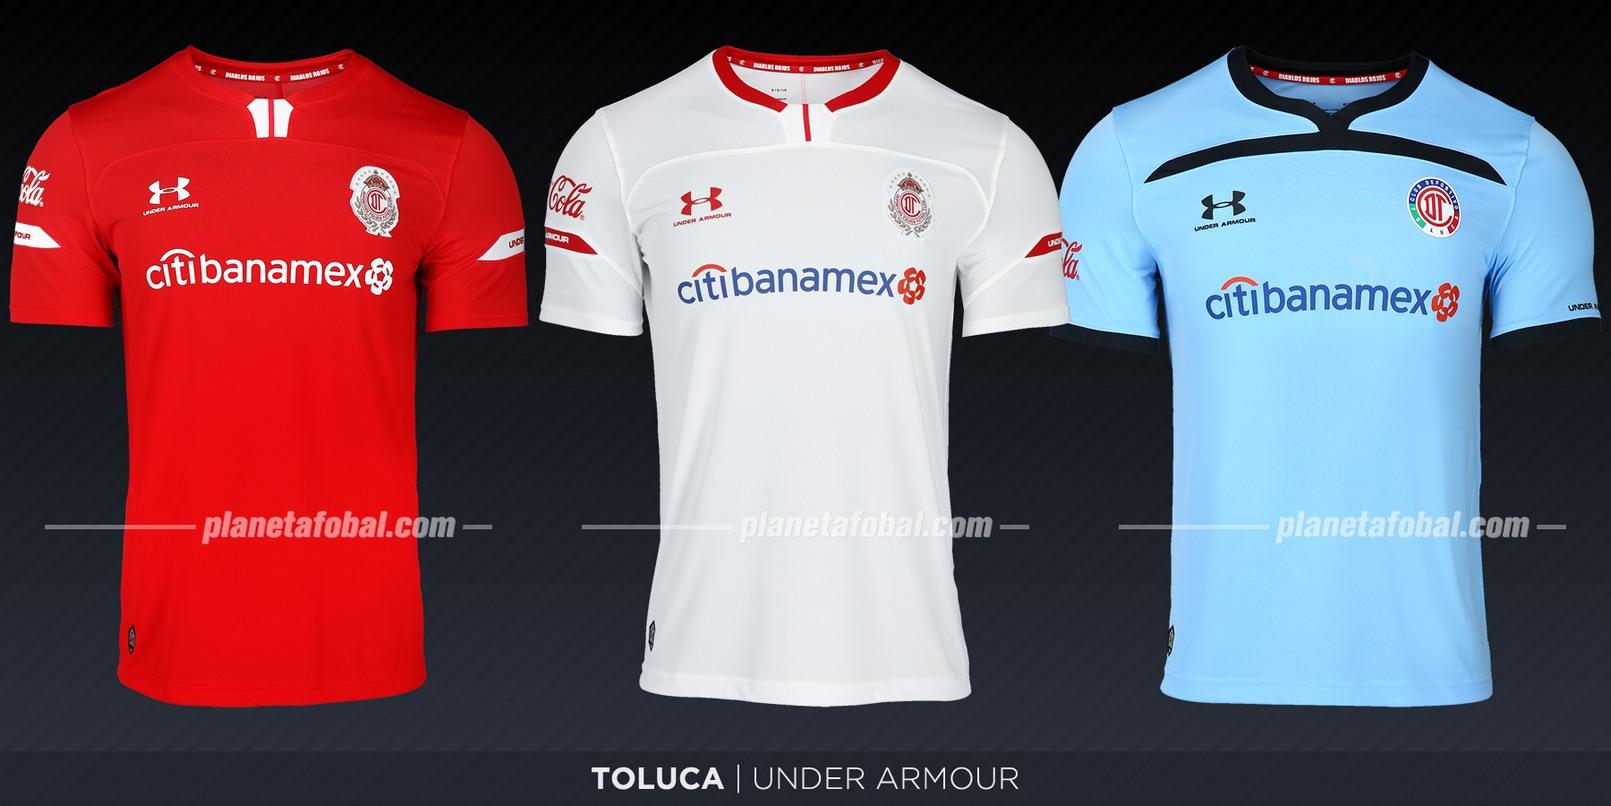 Toluca (Under Armour) | Camisetas de la Liga MX 2019-2020